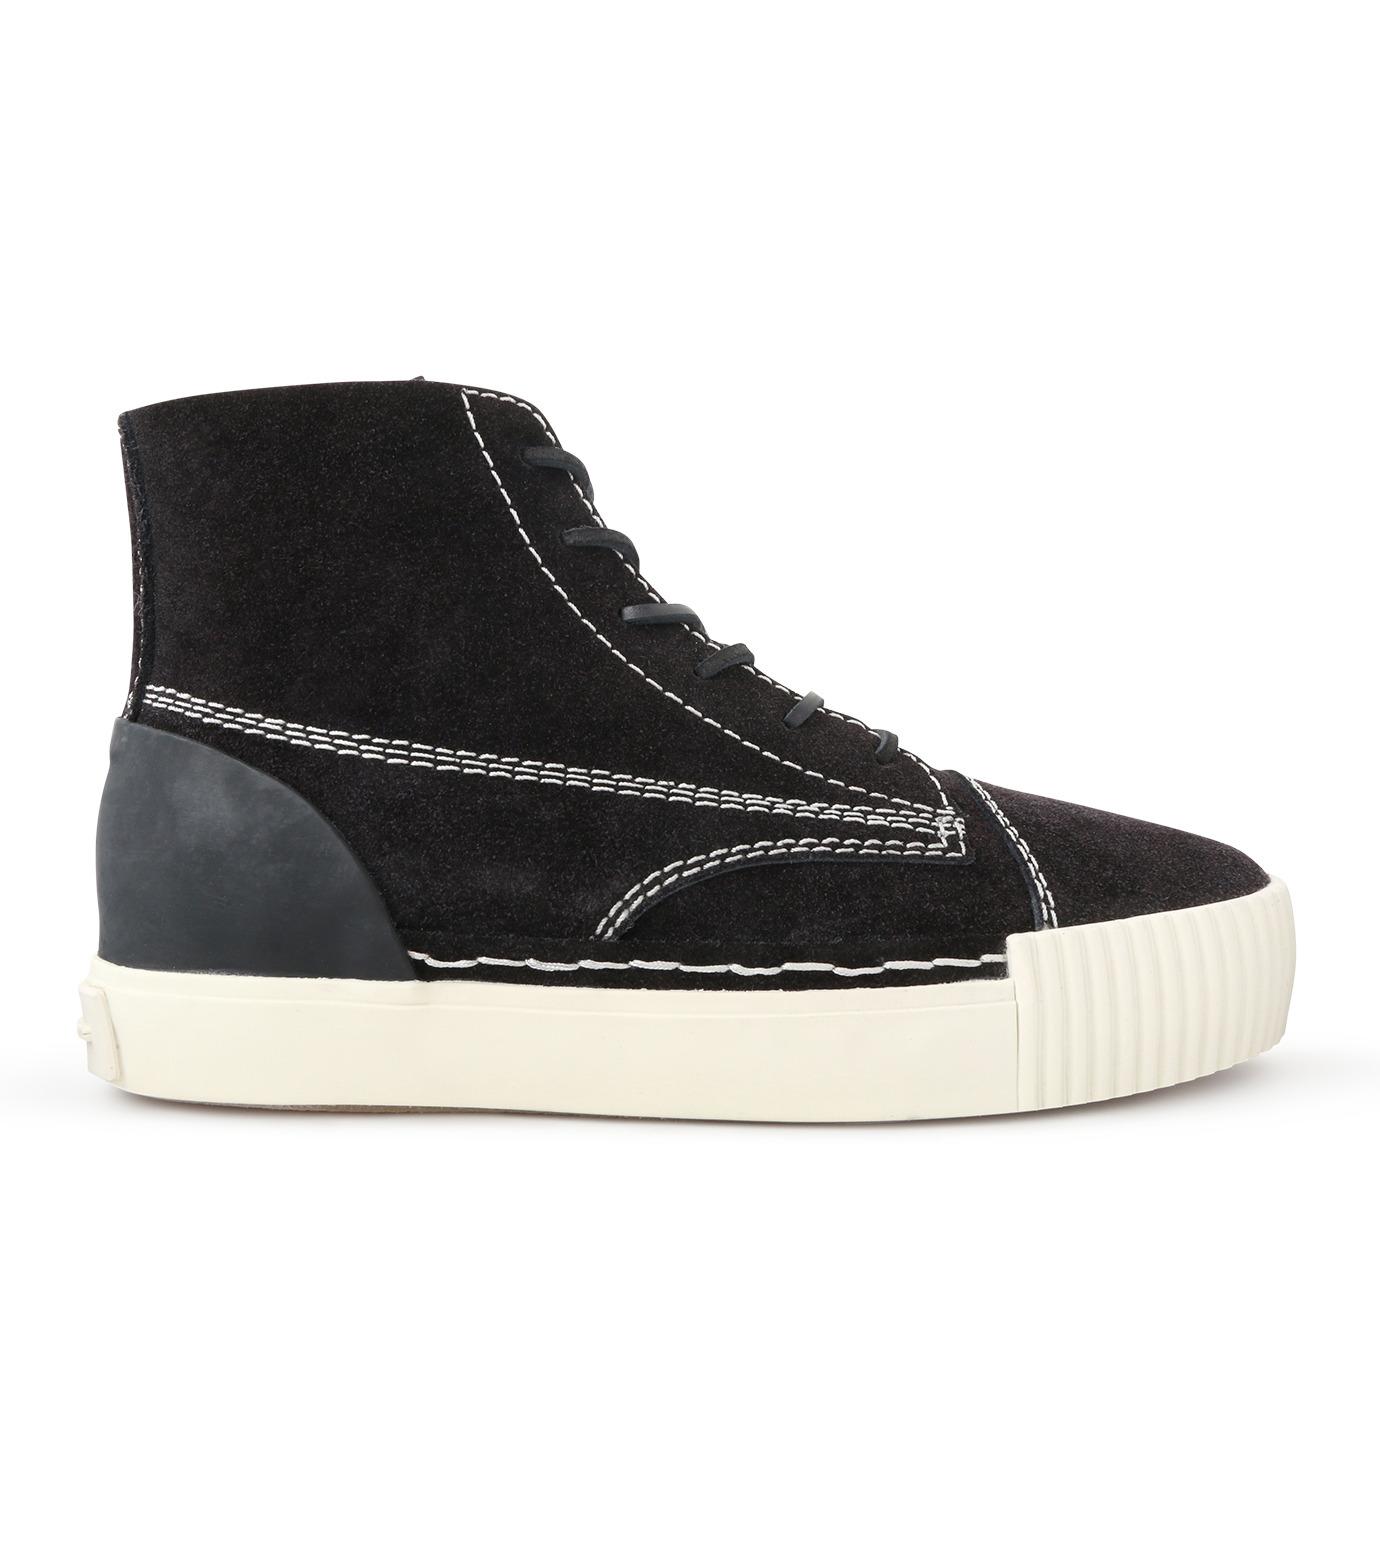 Alexander Wang(アレキサンダーワン)のHicut Sneaker-BLACK(スニーカー/sneaker)-315122F16-13 拡大詳細画像1